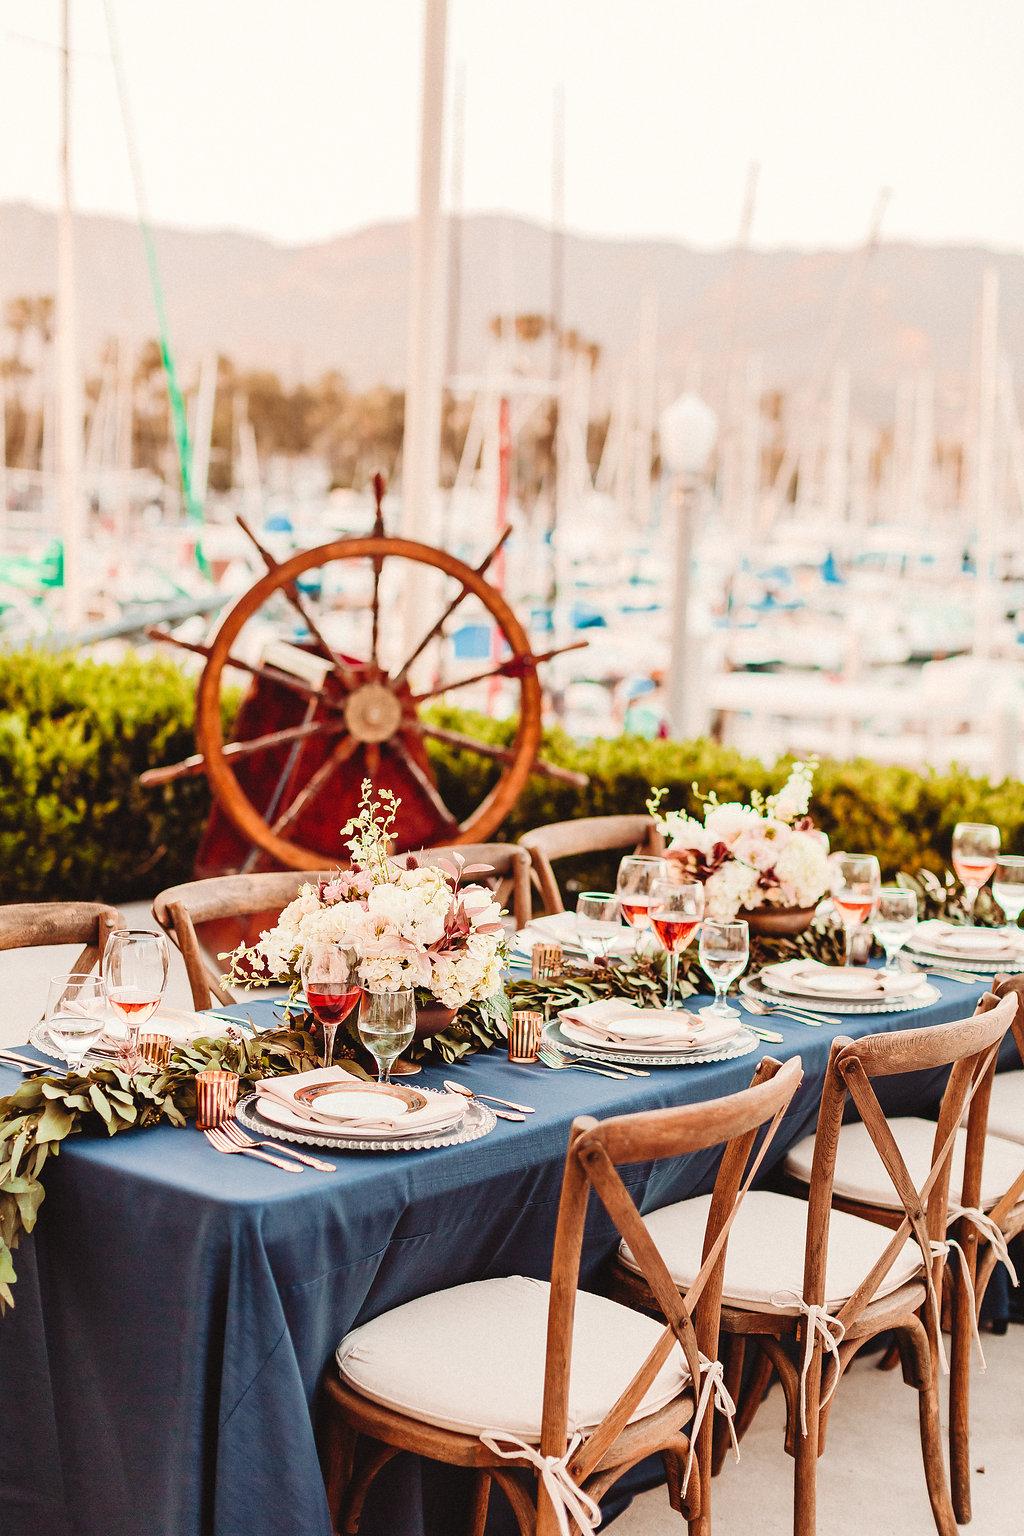 www.santabarbarawedding.com | Rewind Photography | Santa Barbara Maritime Museum | Table Setting